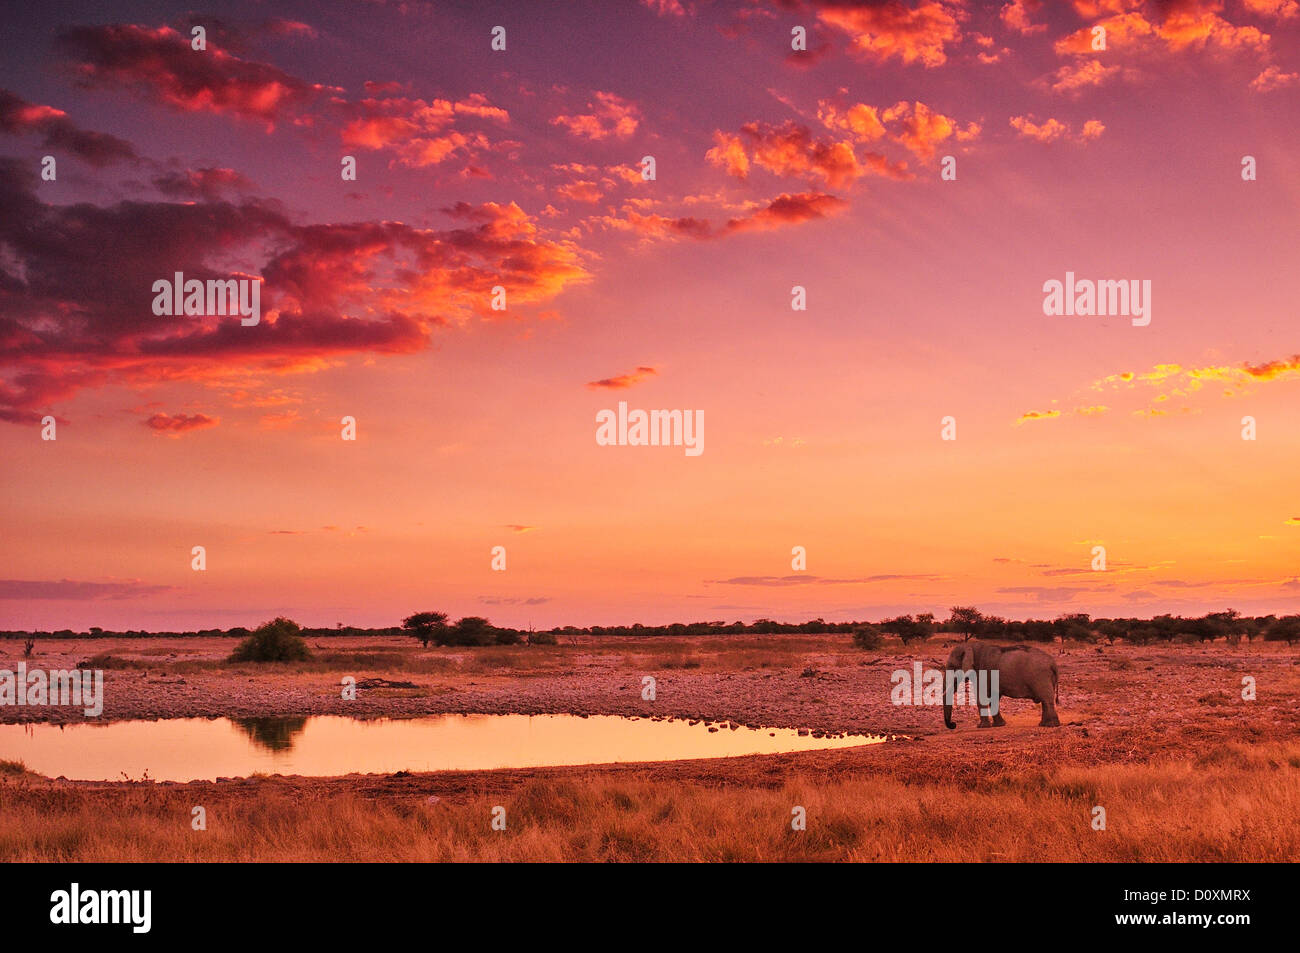 Africa, Namibia, Etosha National Park, tramonto, elefante, animale, waterhole, safari, animali selvatici, rosso, Immagini Stock